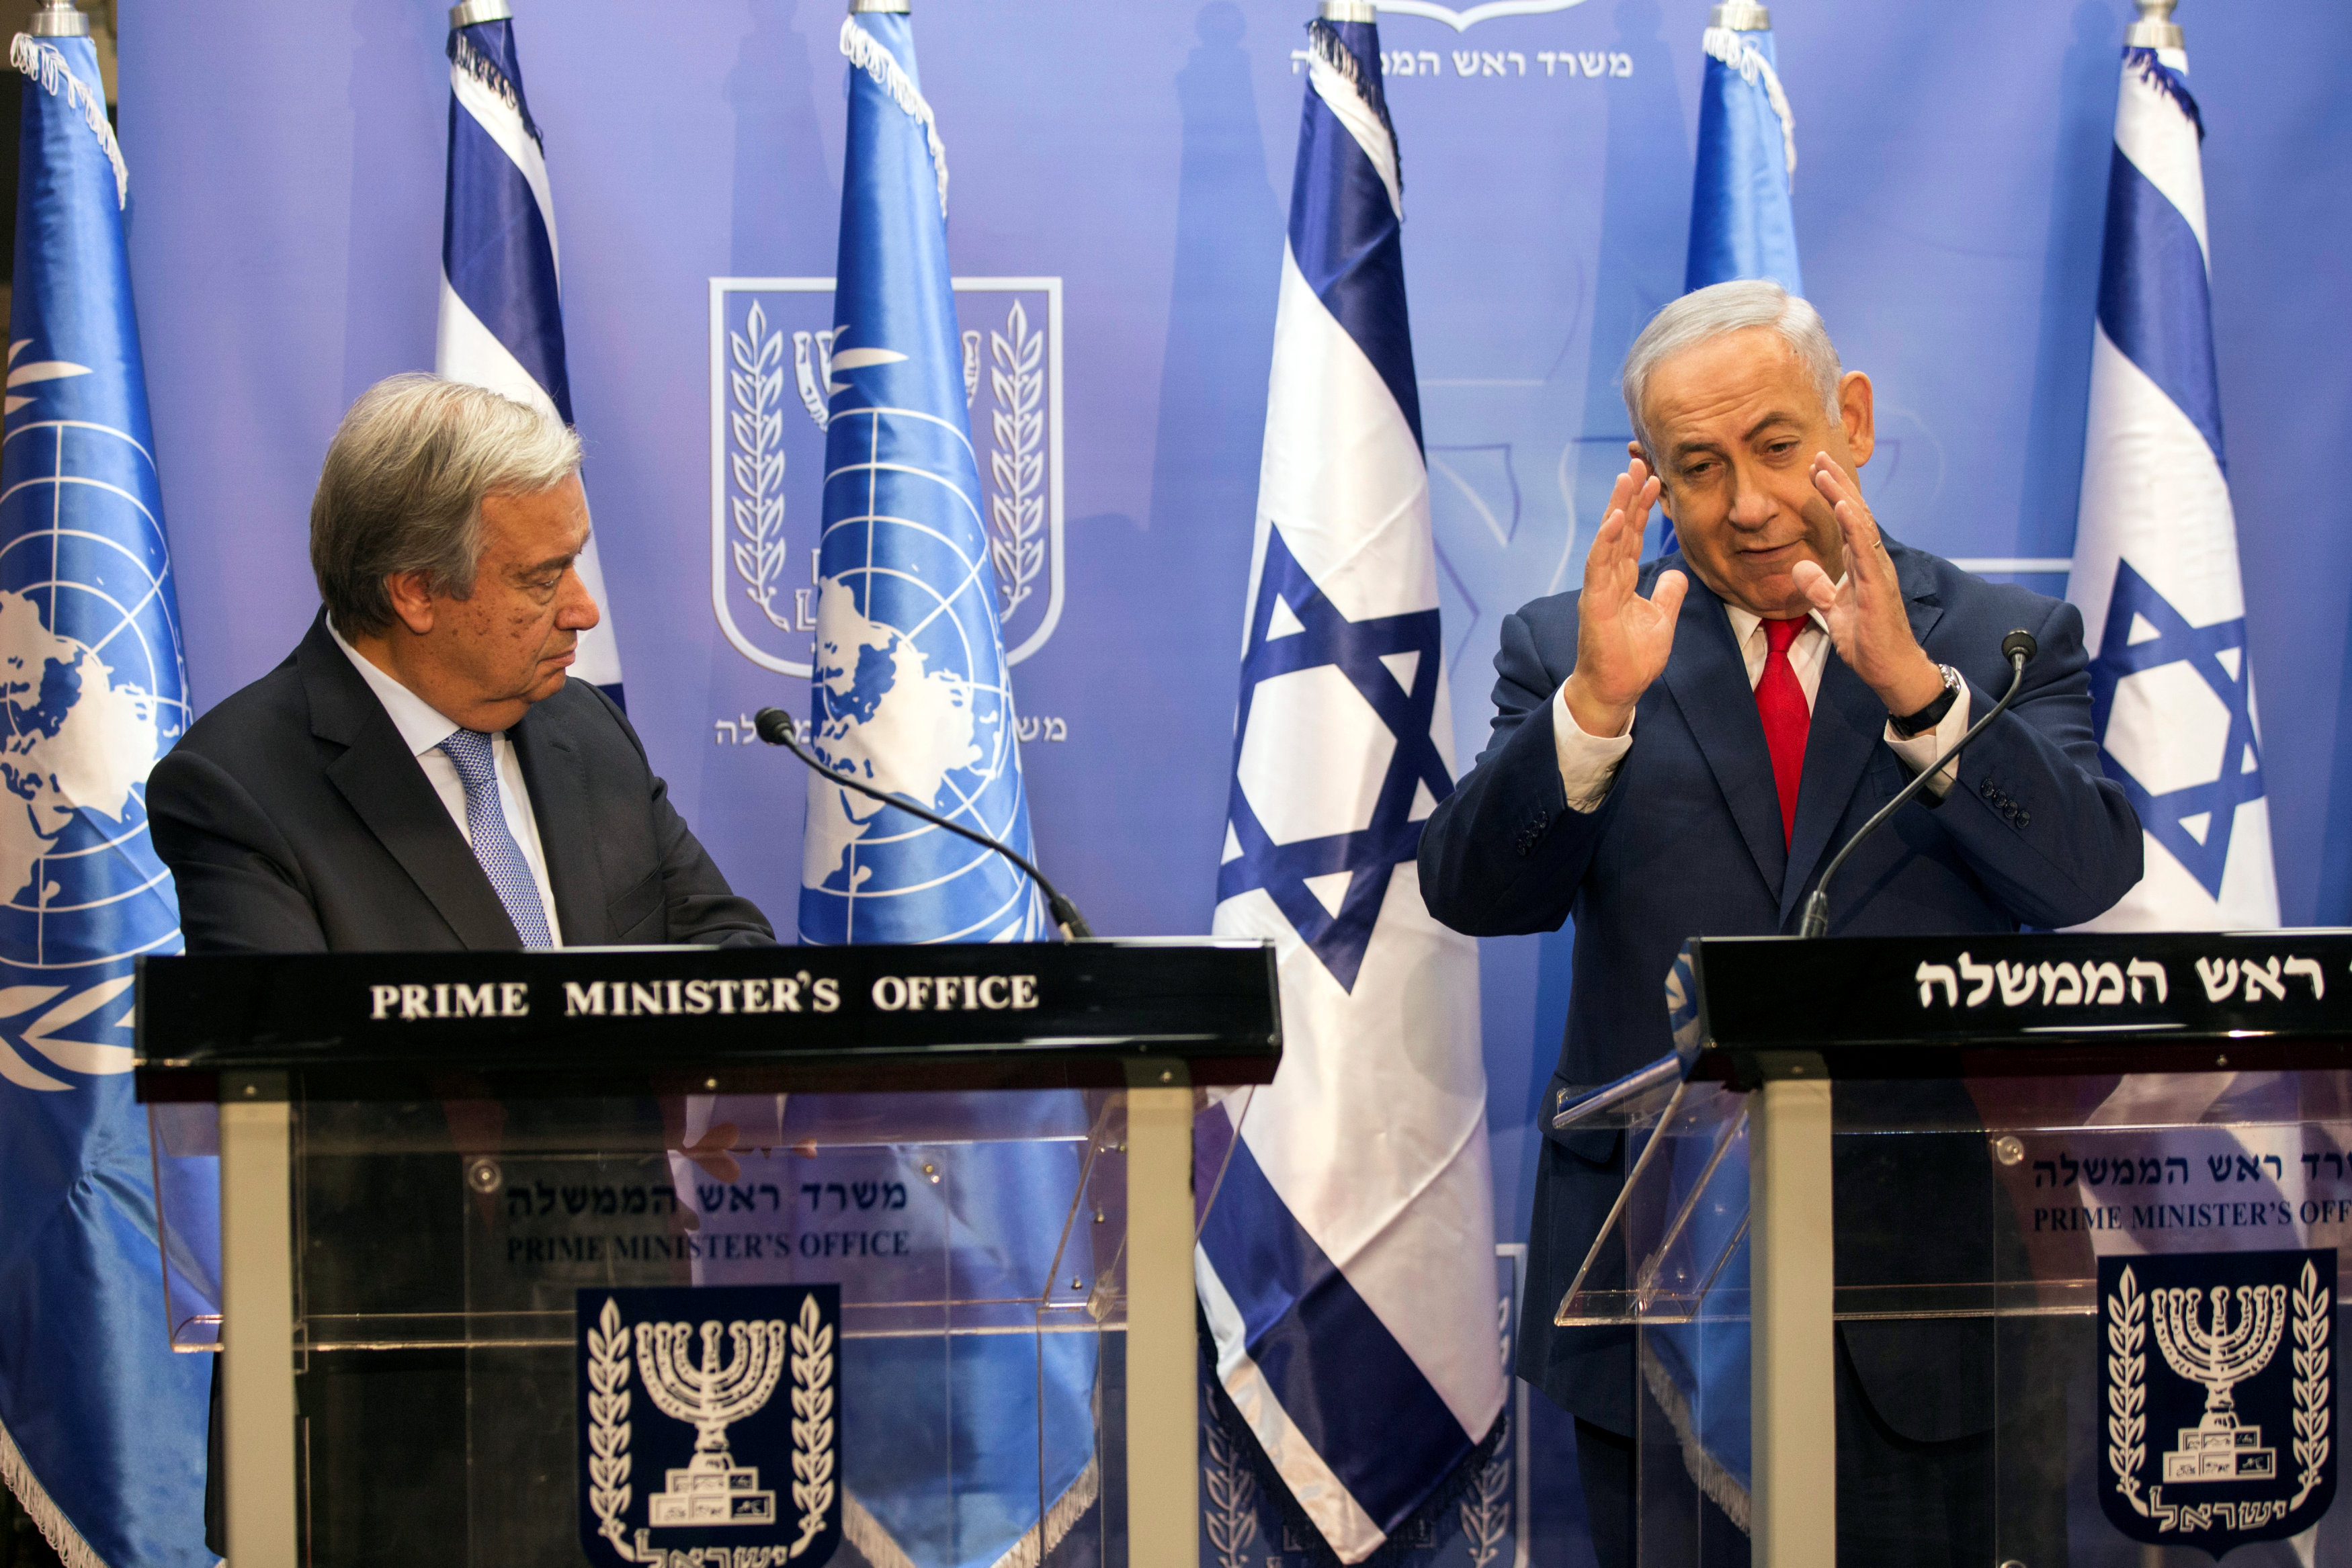 Israeli Prime Minister Benjamin Netanyahu (R) gestures as he delivers a joint statement with U.N. Secretary General Antonio Guterres in Jerusalem August 28,